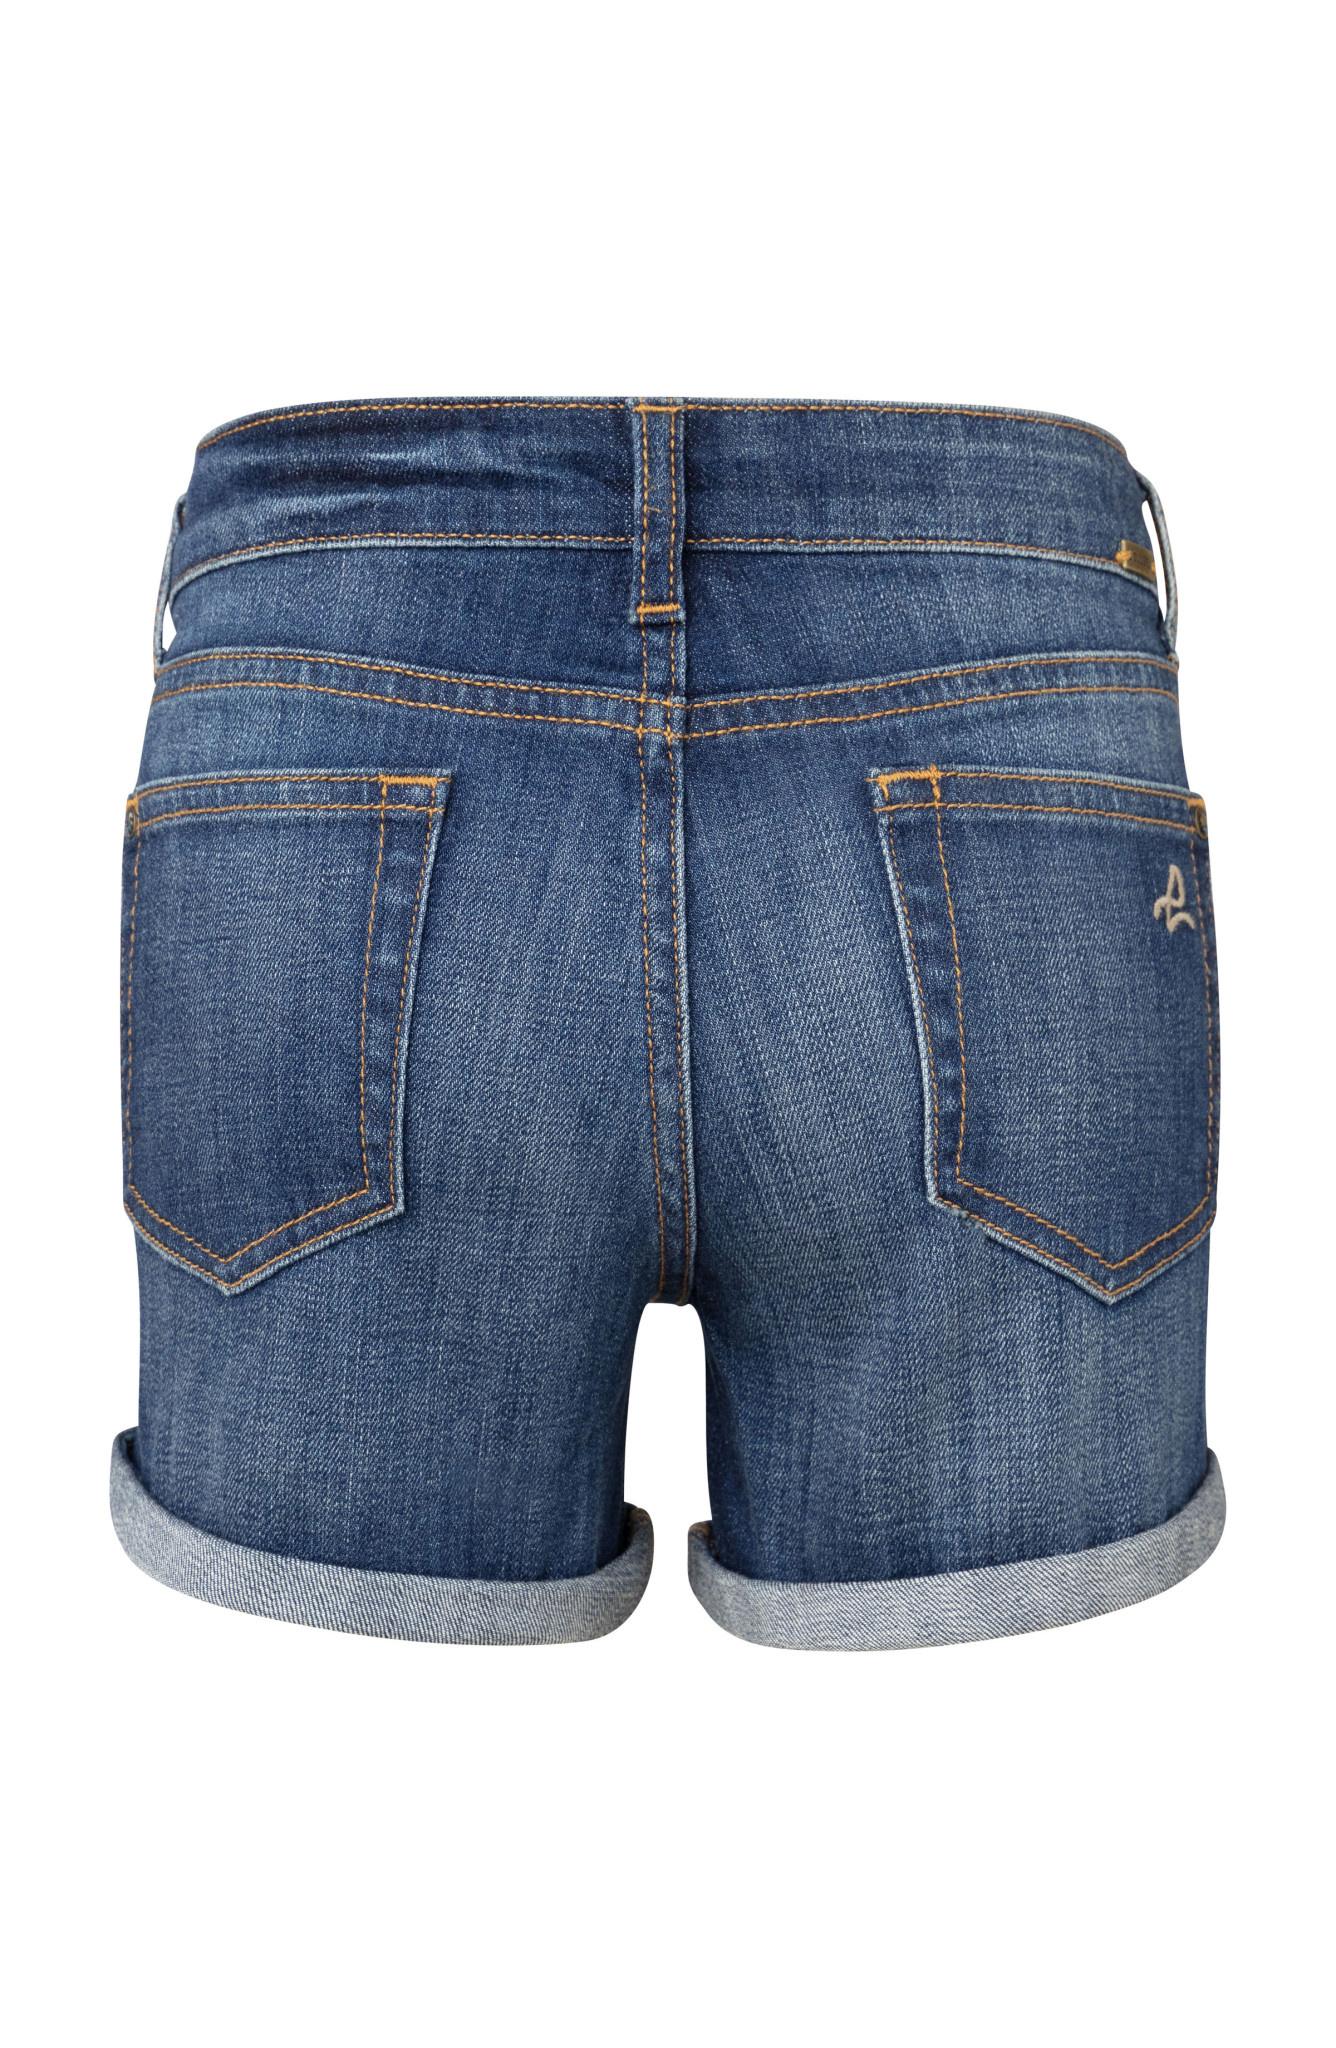 DL1961 Denim Piper Shorts